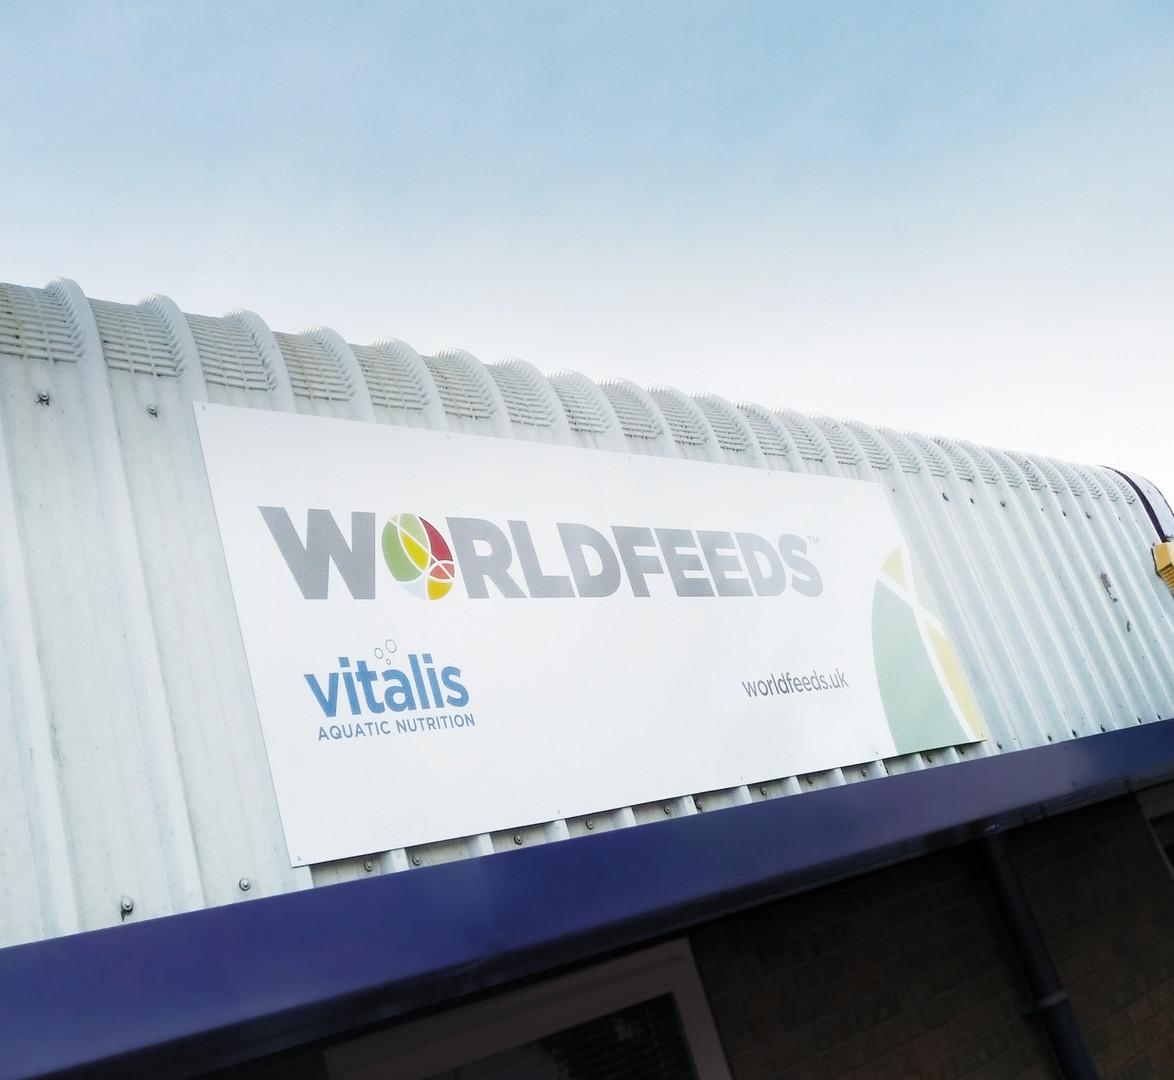 World-Feeds-Sign.jpg